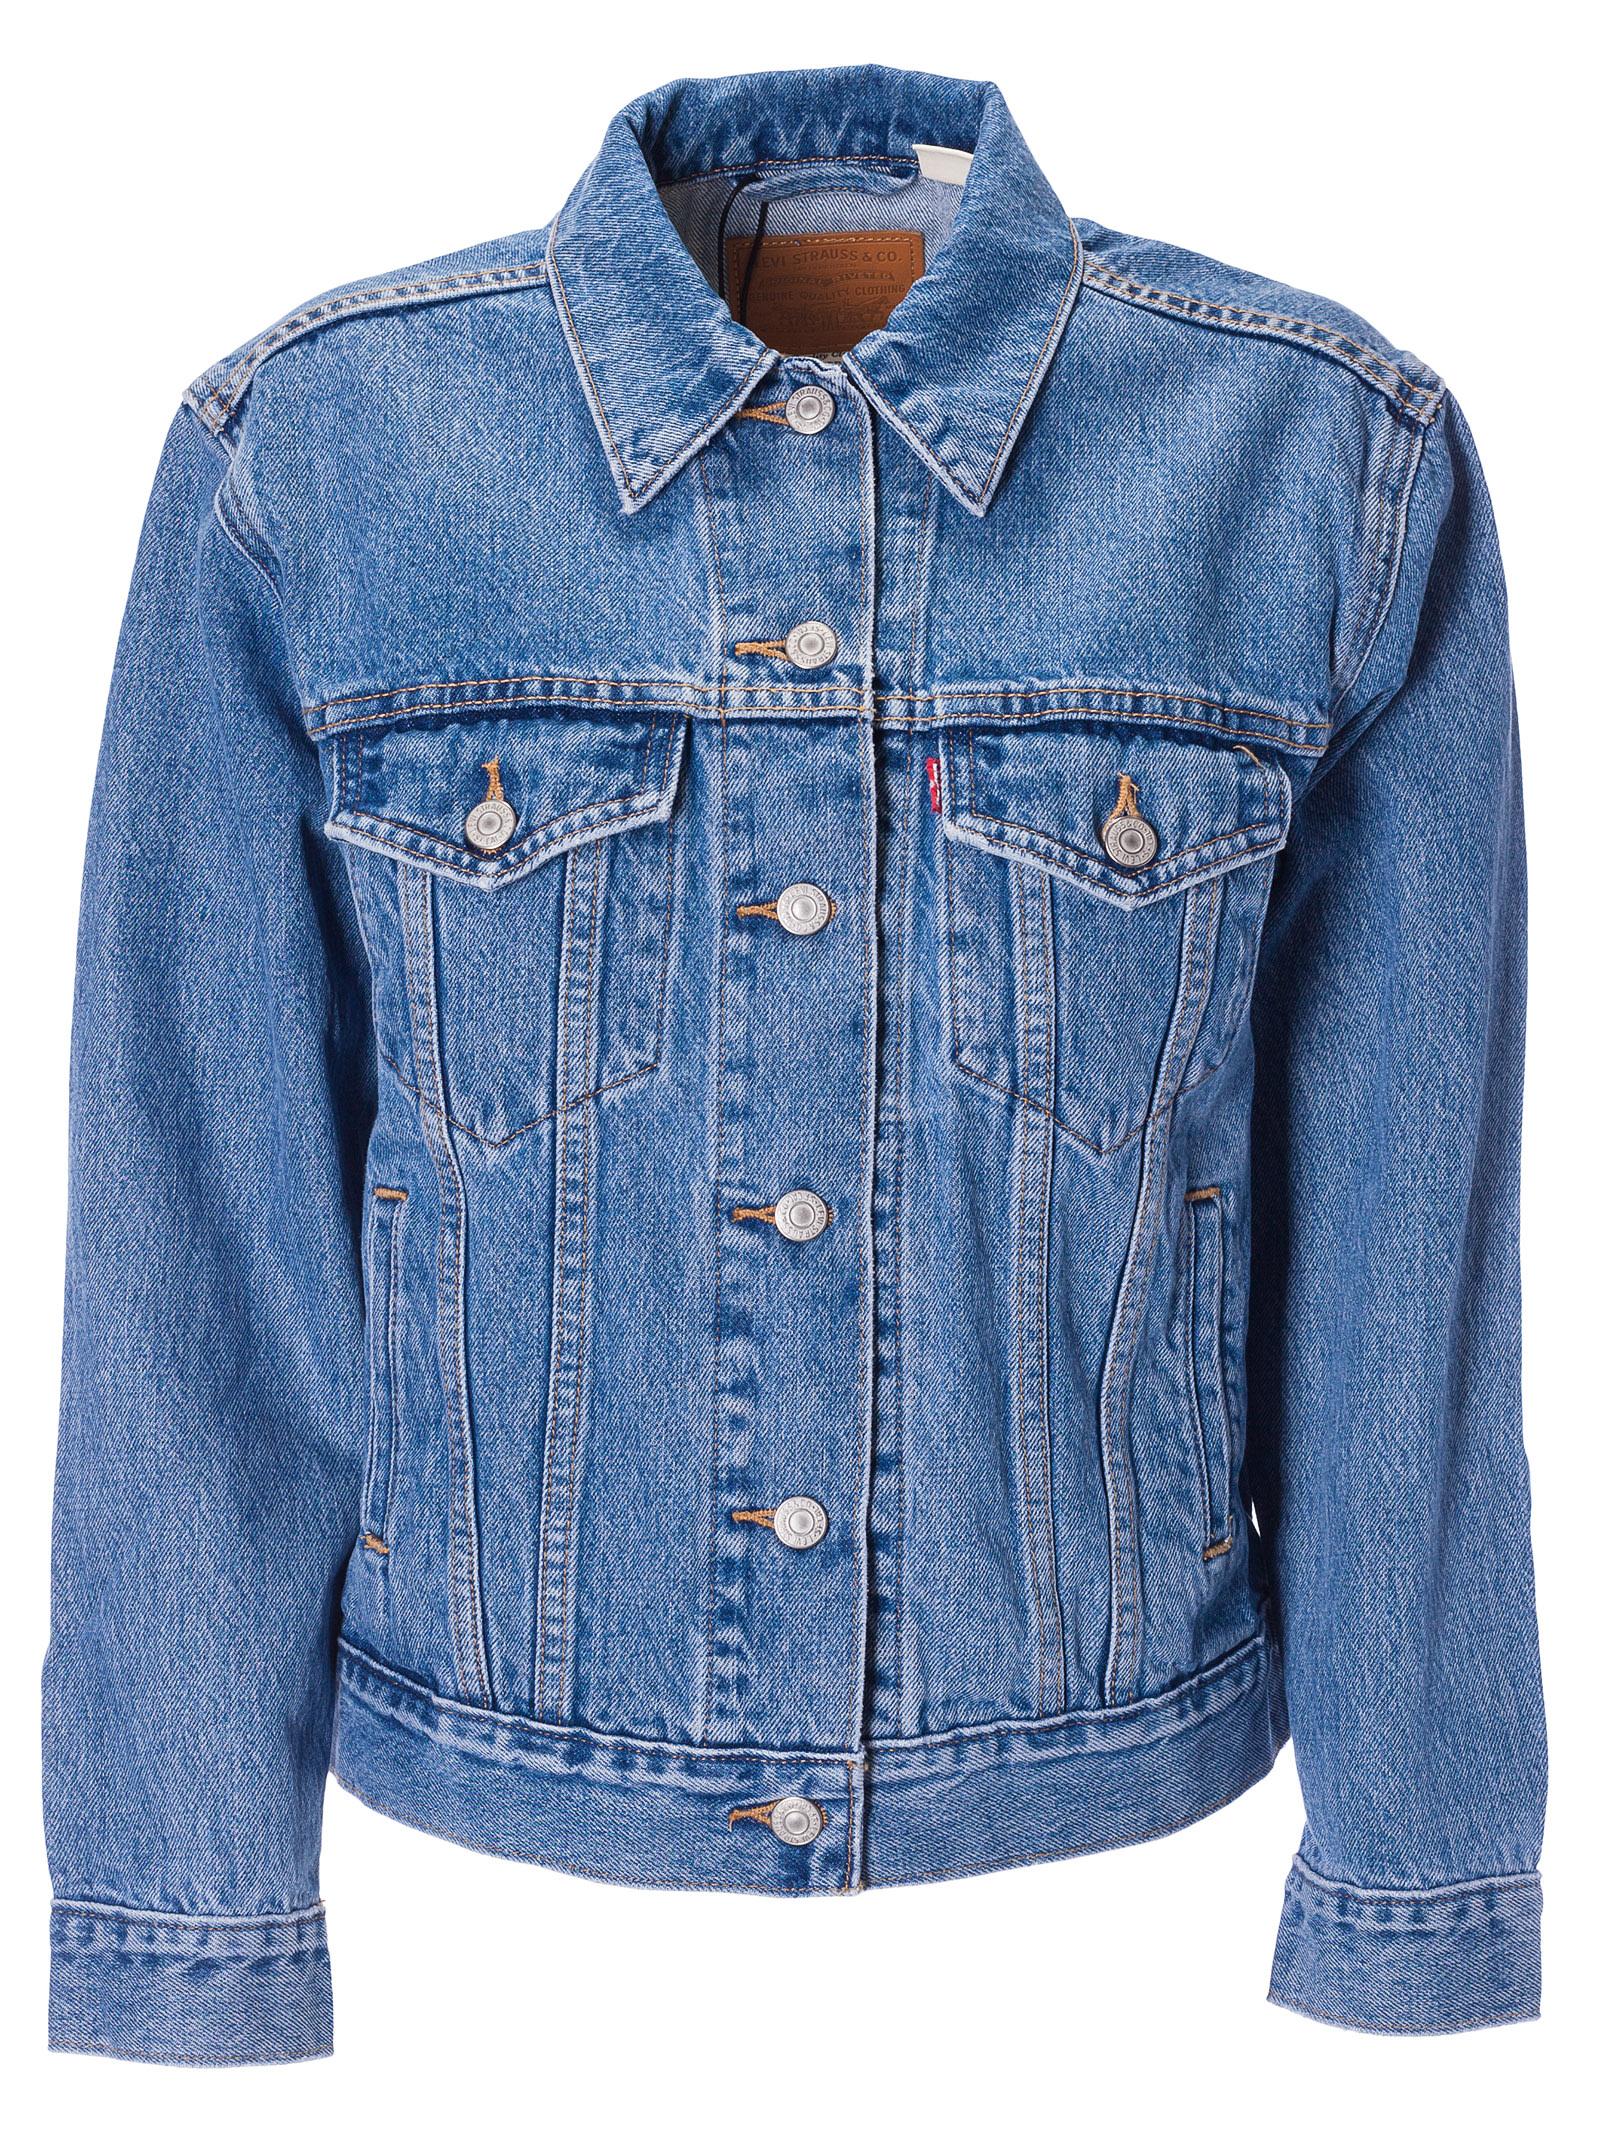 Levis Buttoned Jacket